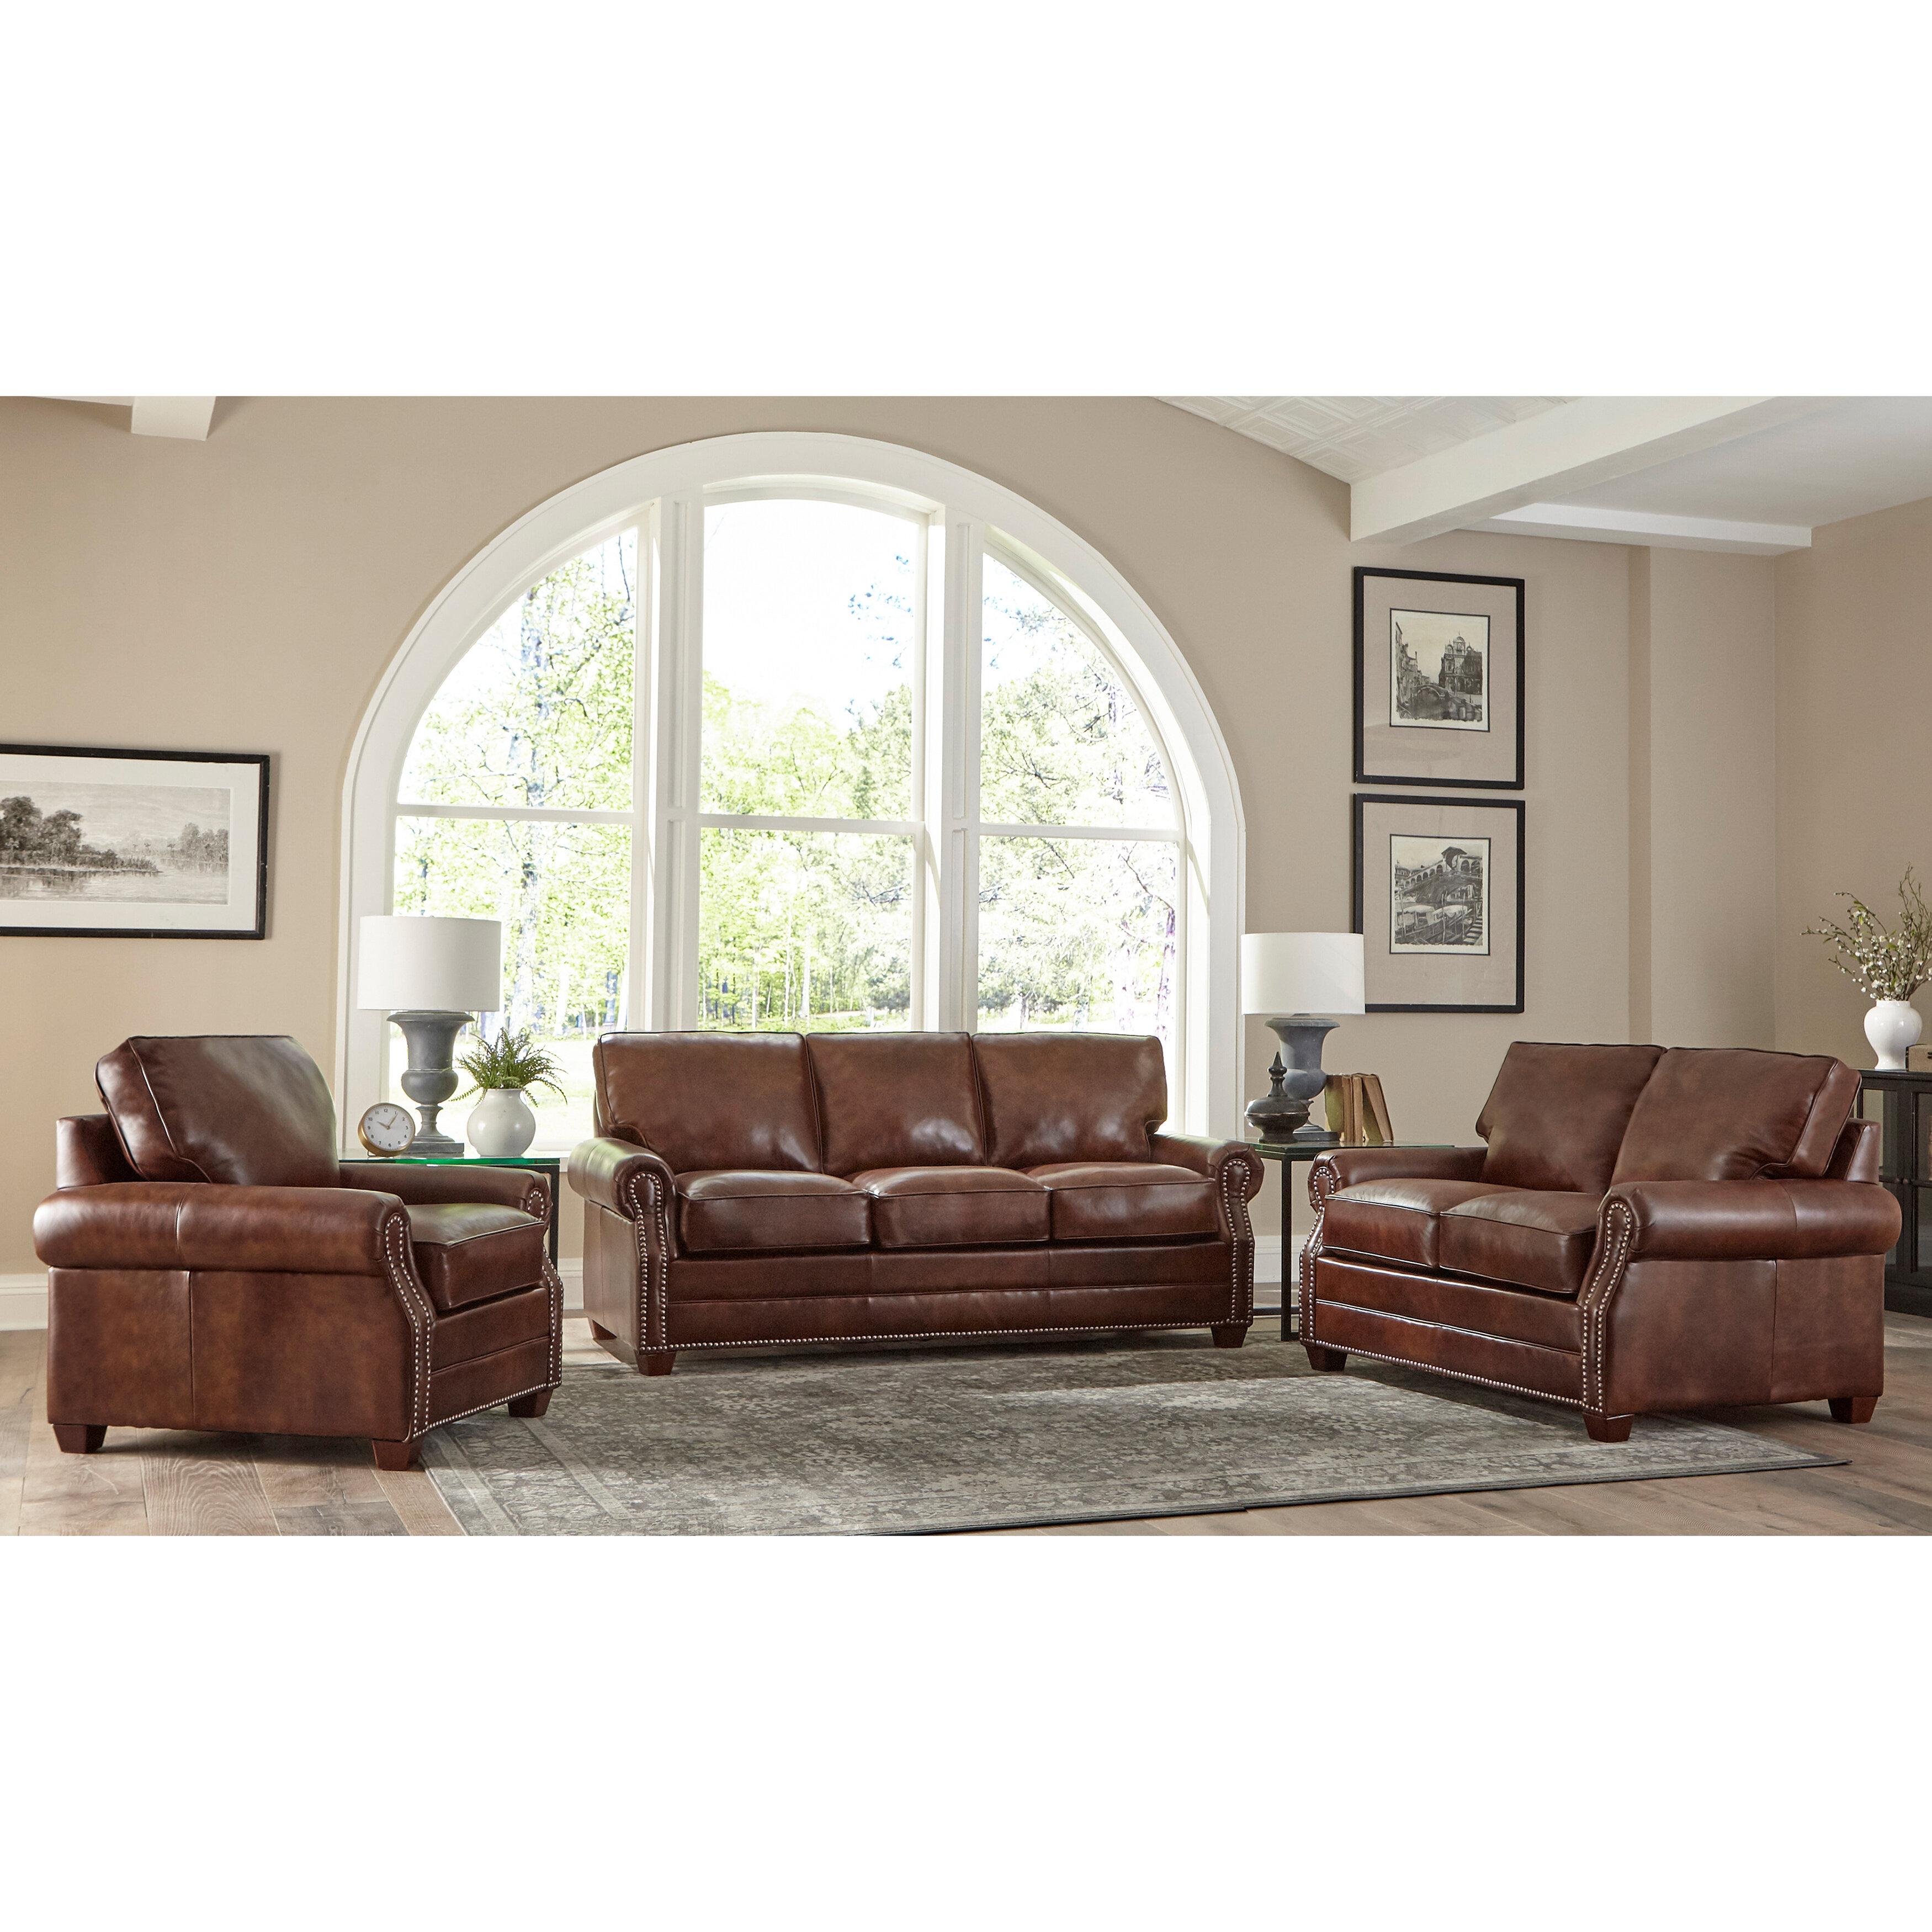 Lyndsey 5 Piece Leather Sleeper Living Room Set